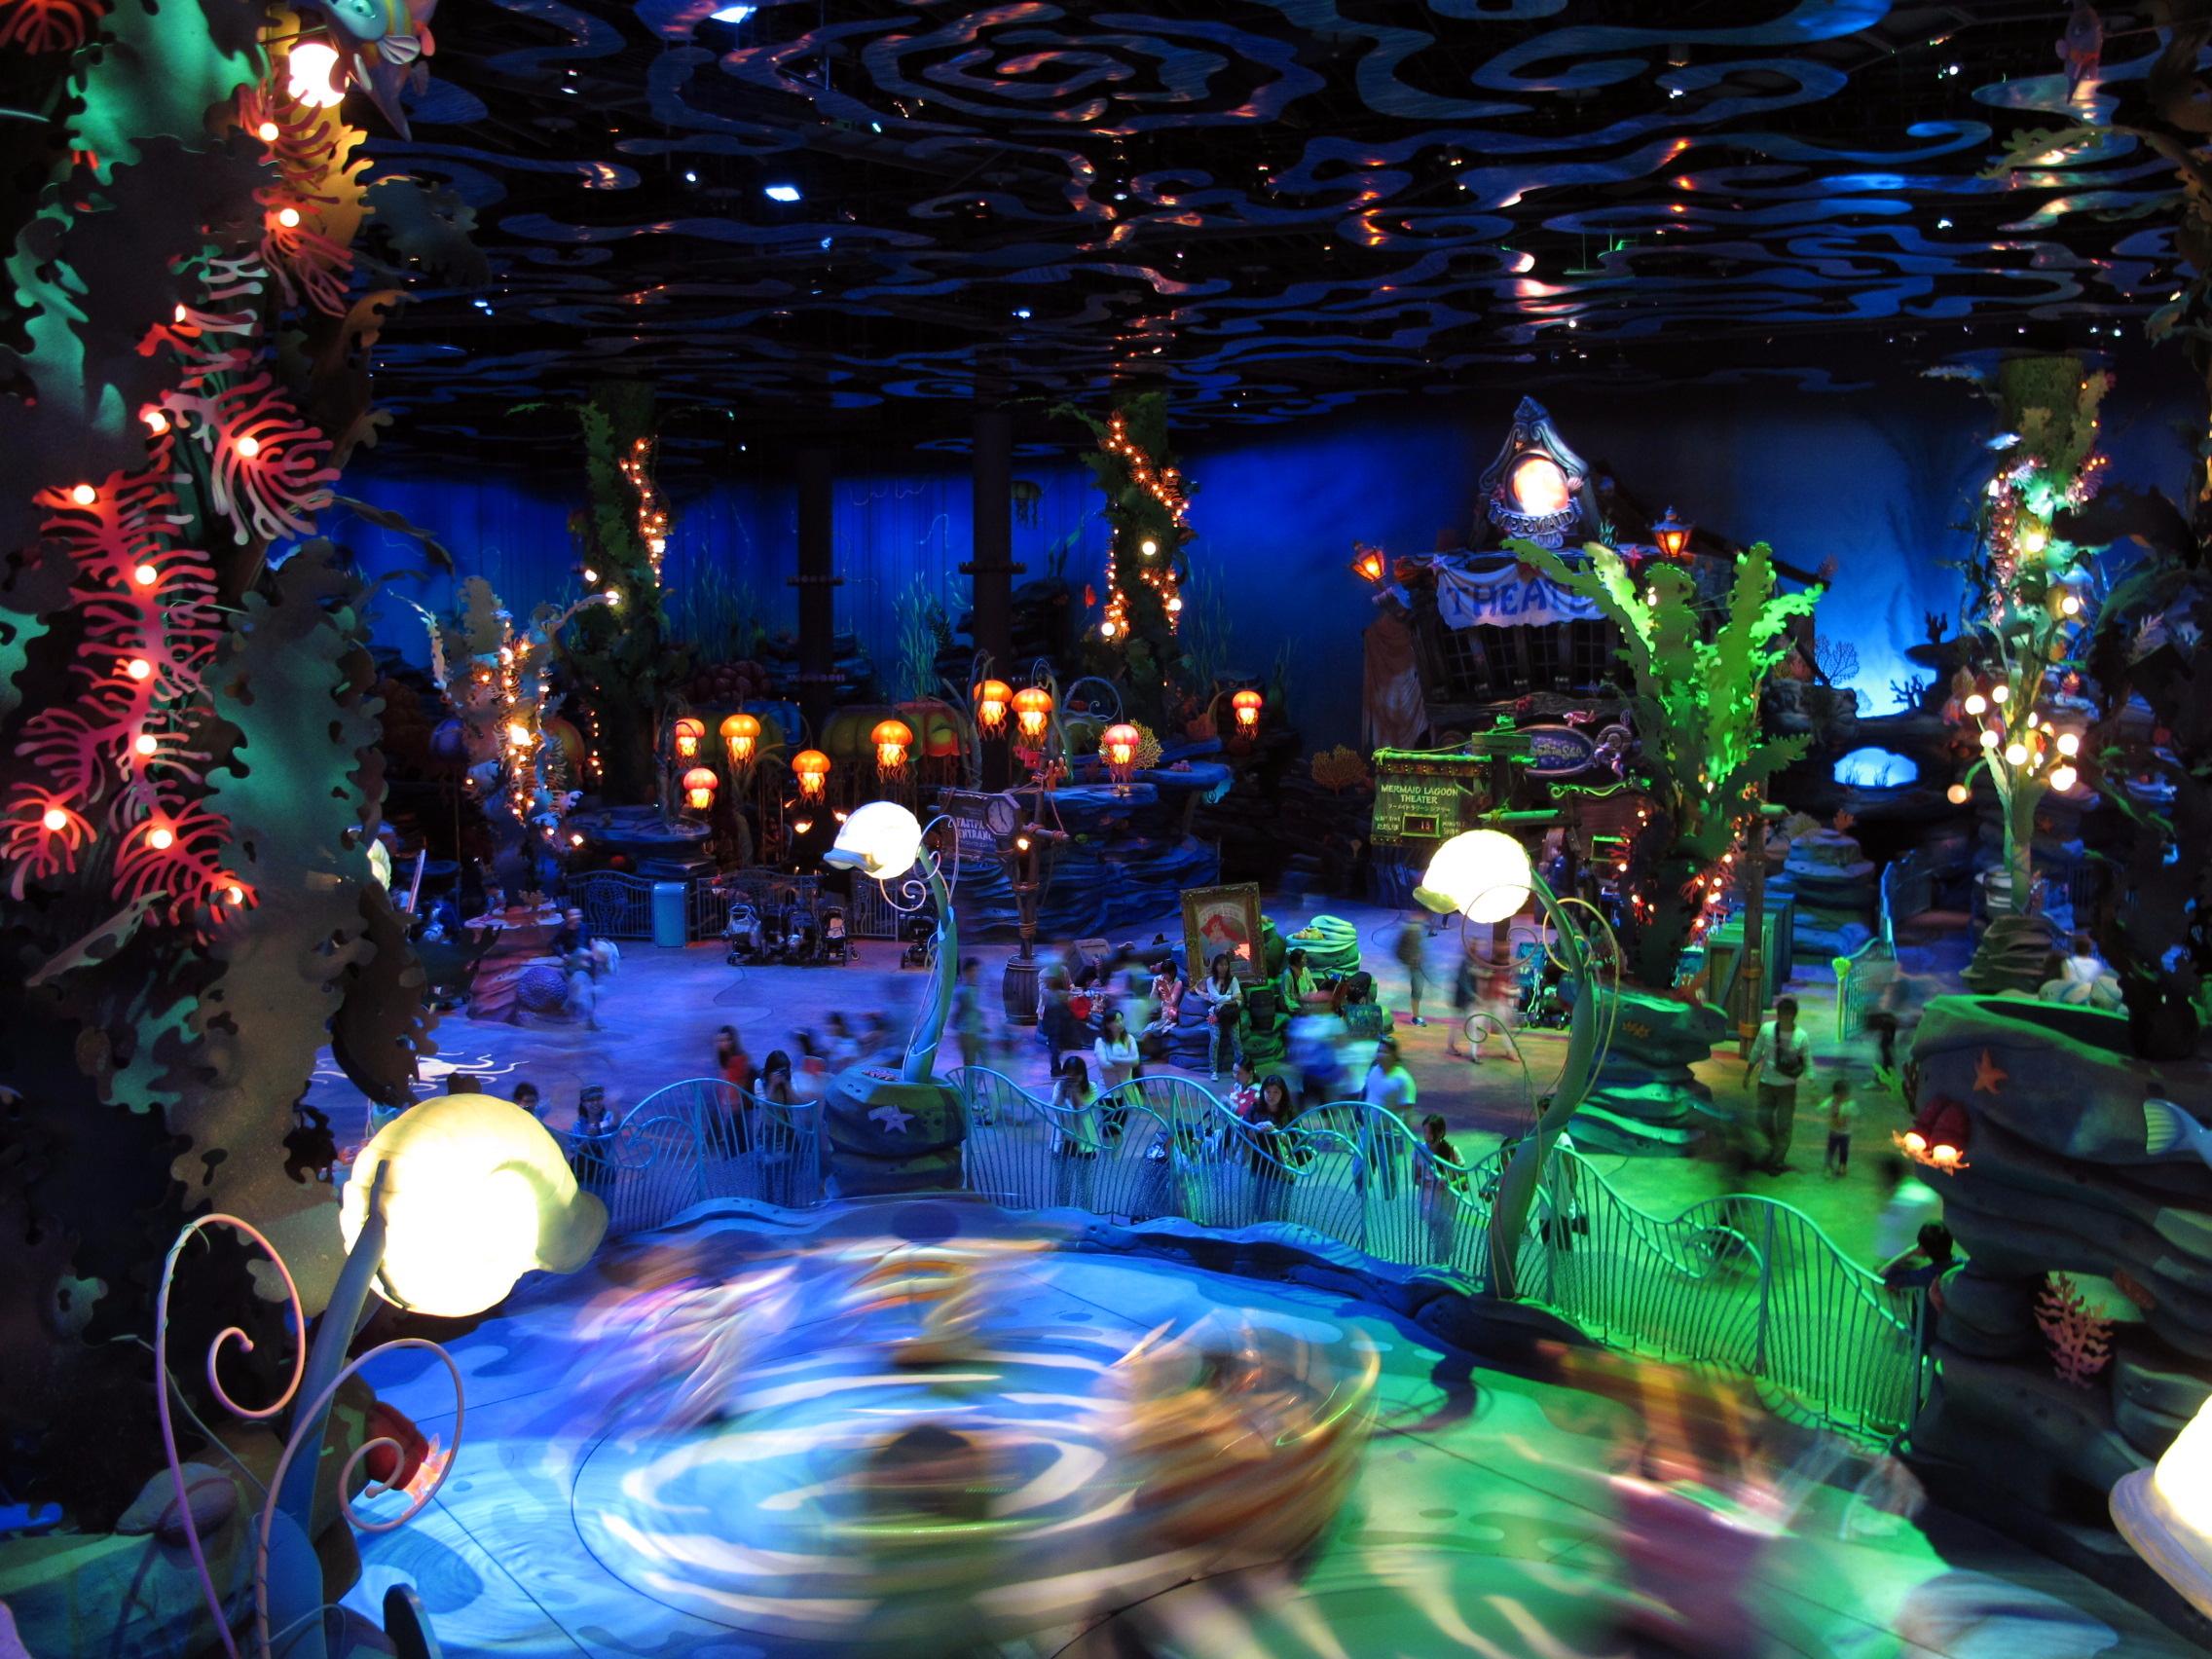 File:Tokyo DisneySea Mermaid Lagoon Interior View 201306